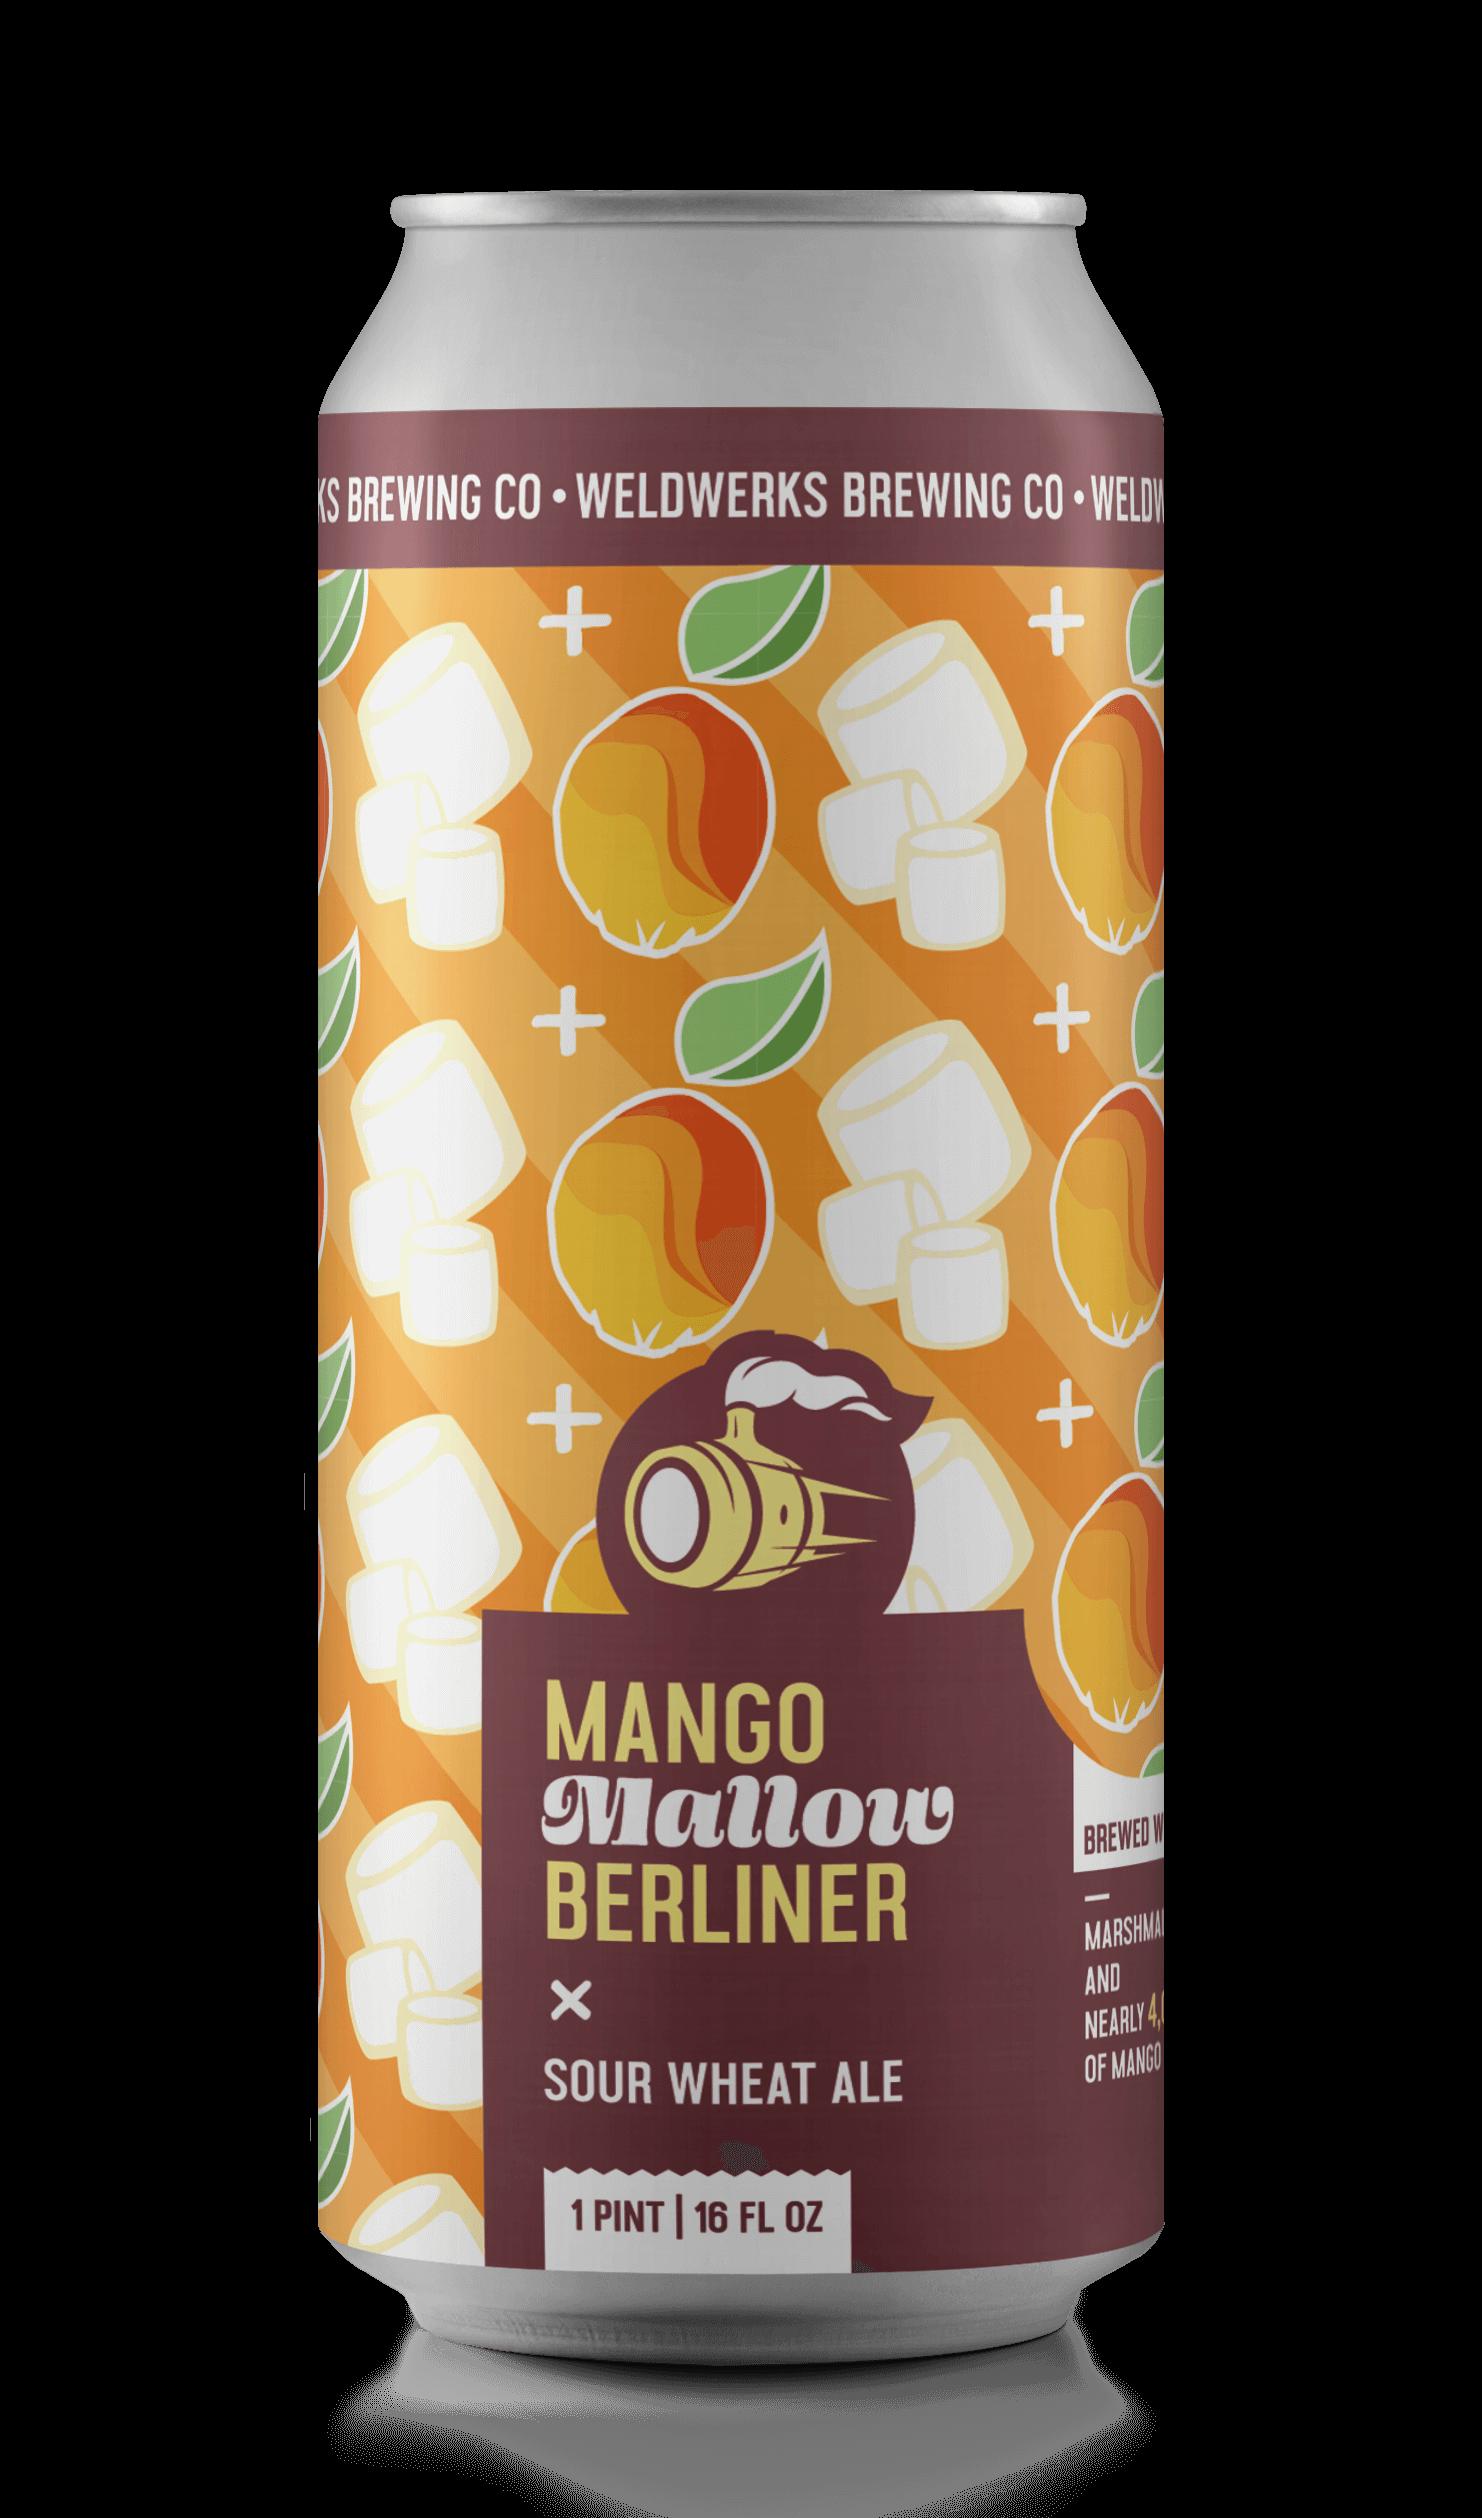 Mango Mallo Berliner